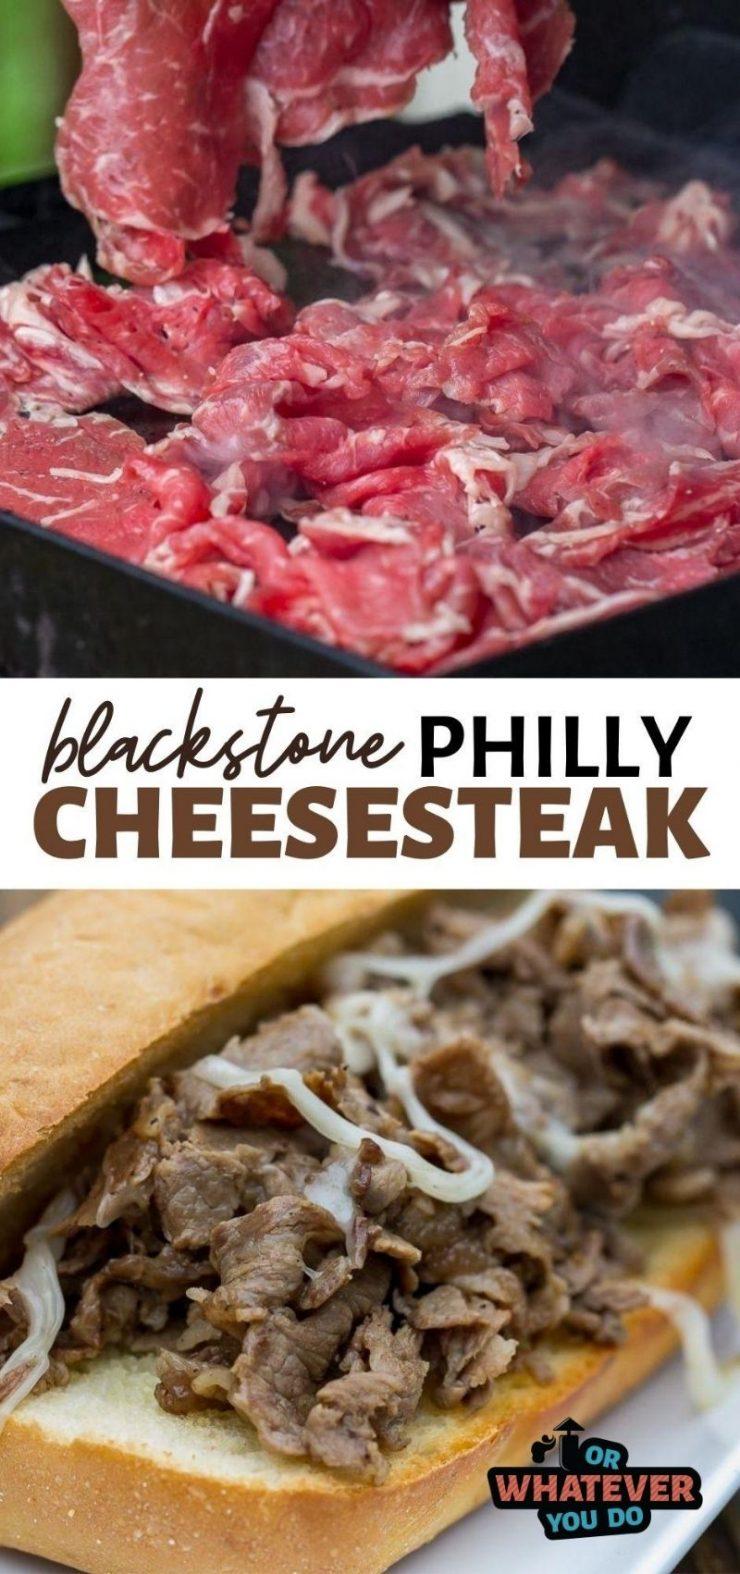 Blackstone Philly Cheesesteak